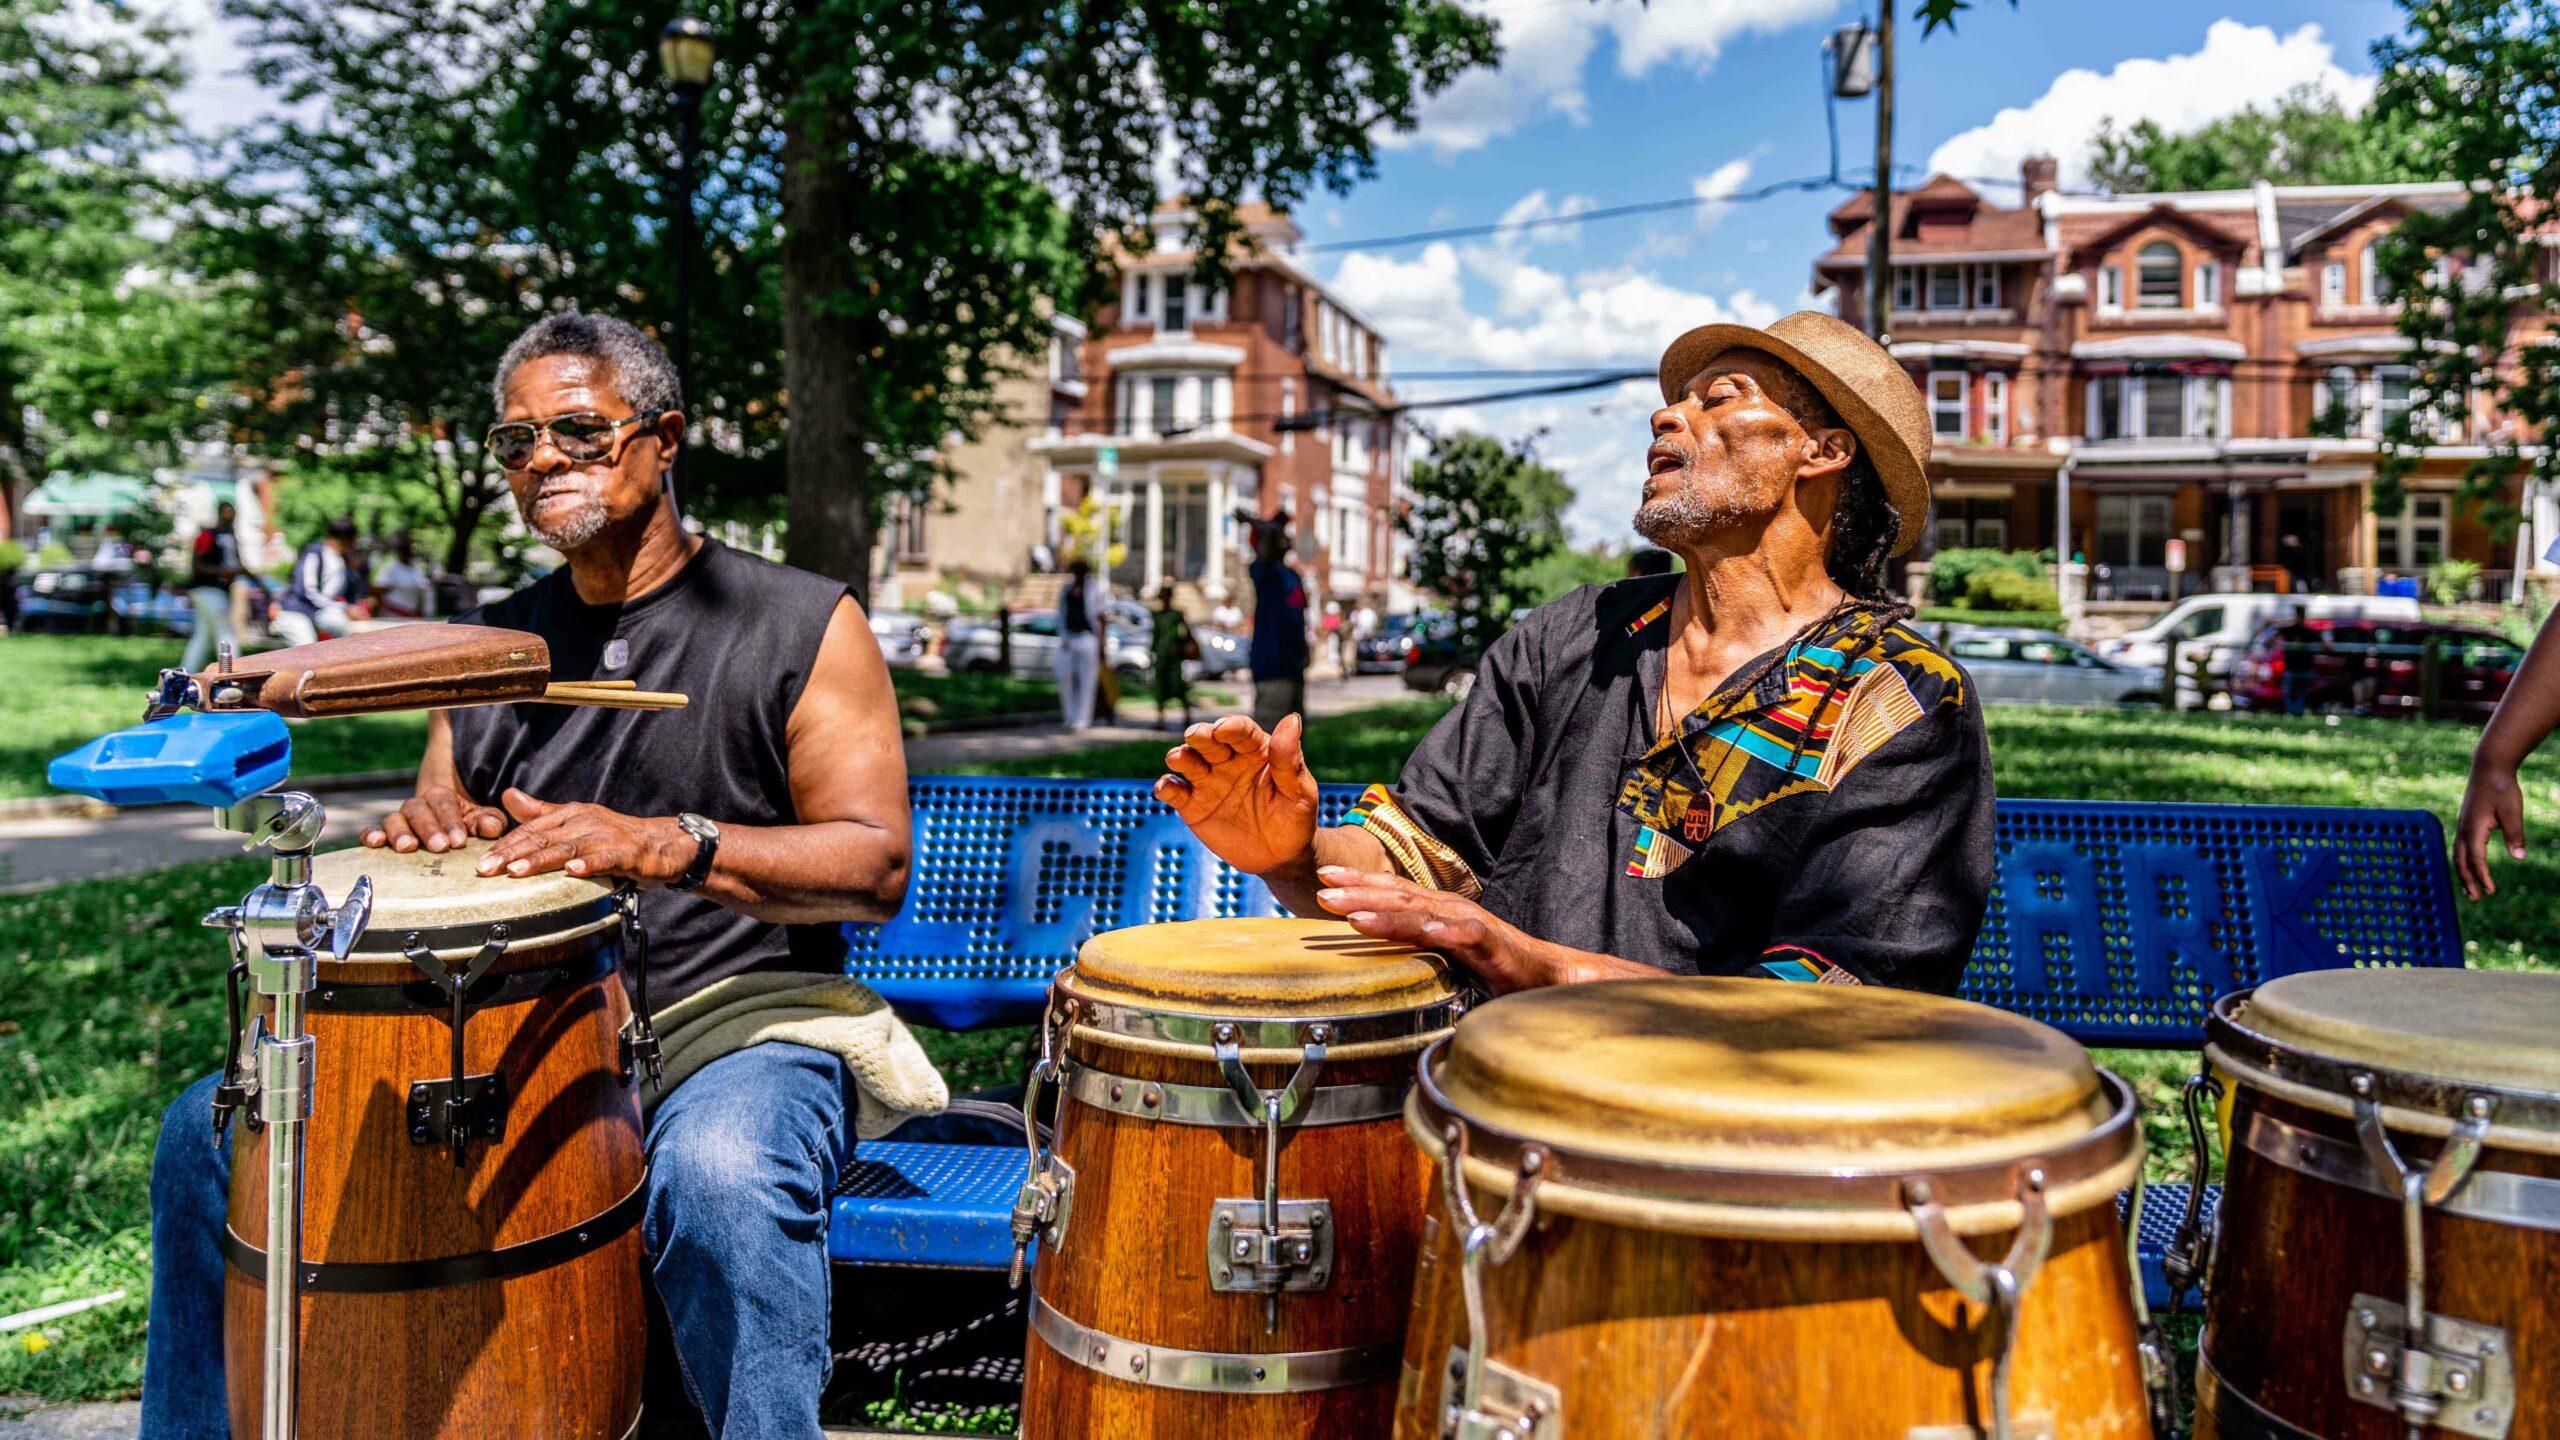 Juneteenth en Philly - El Sol Latino